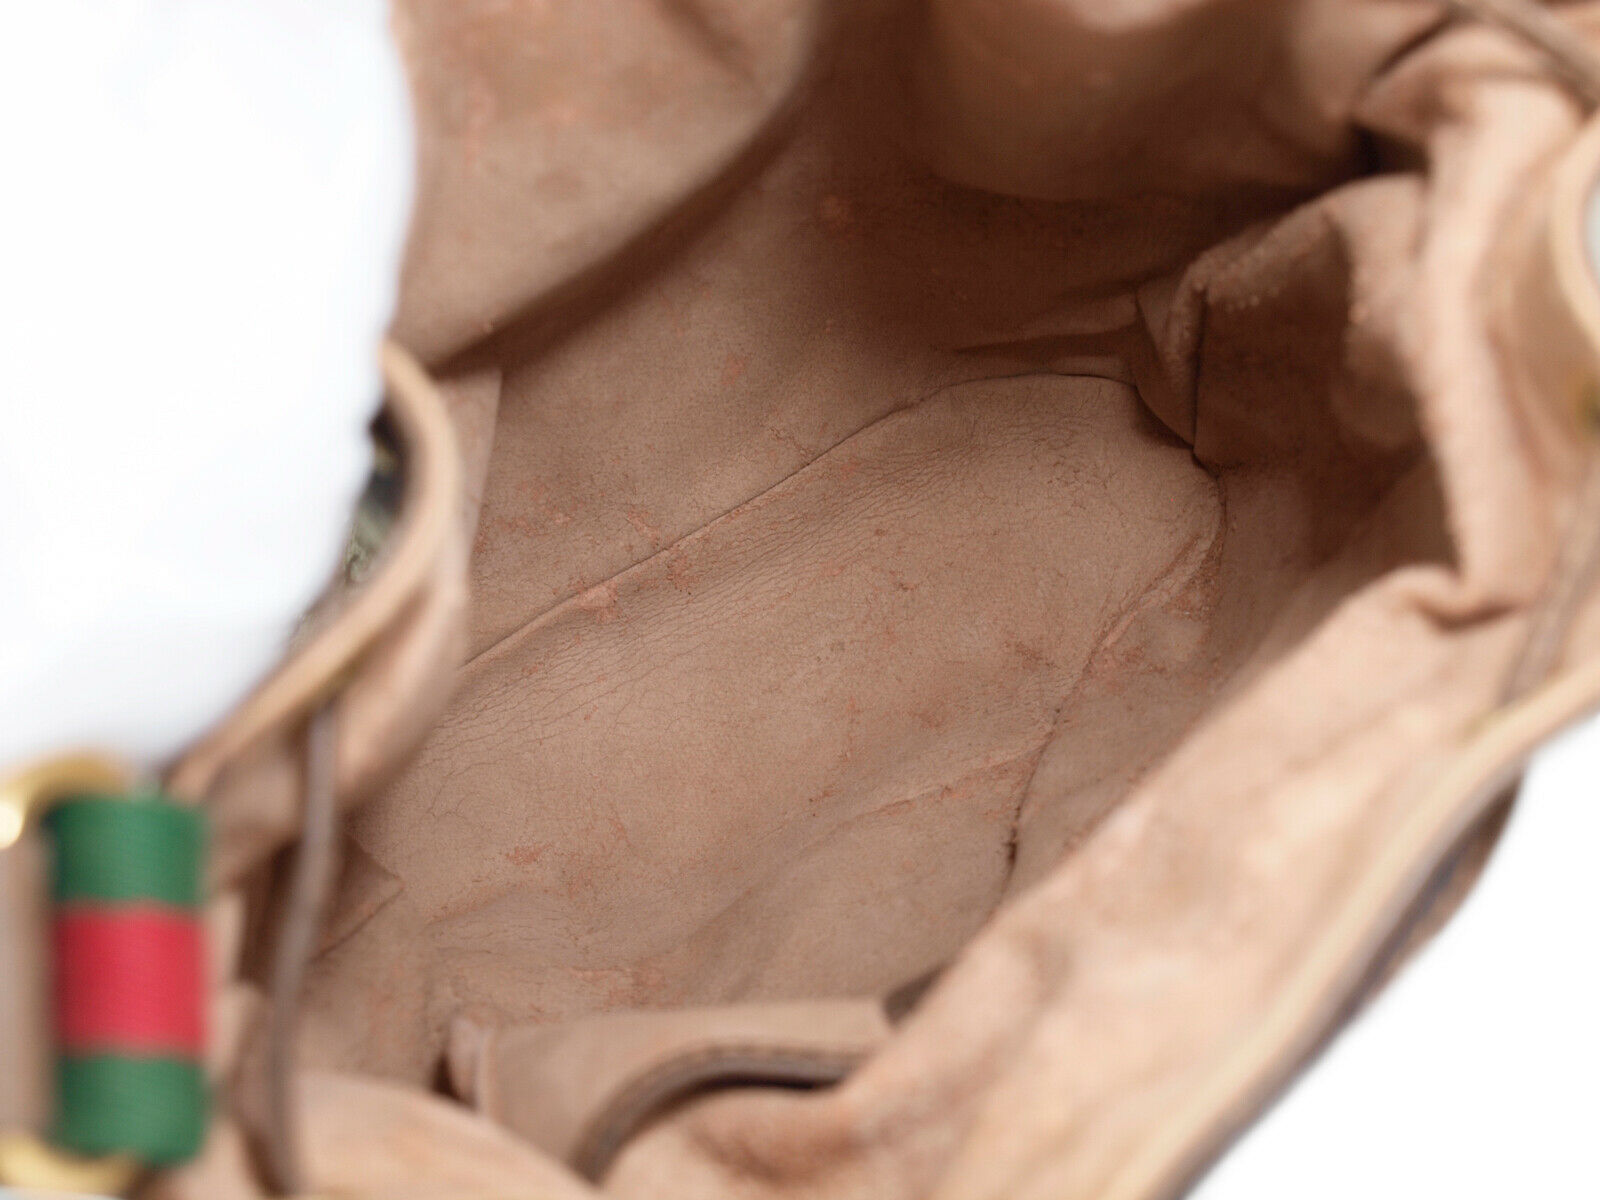 GUCCI GG Web PVC Canvas Leather Browns Drawstring Shoulder Bag GS2171 image 8